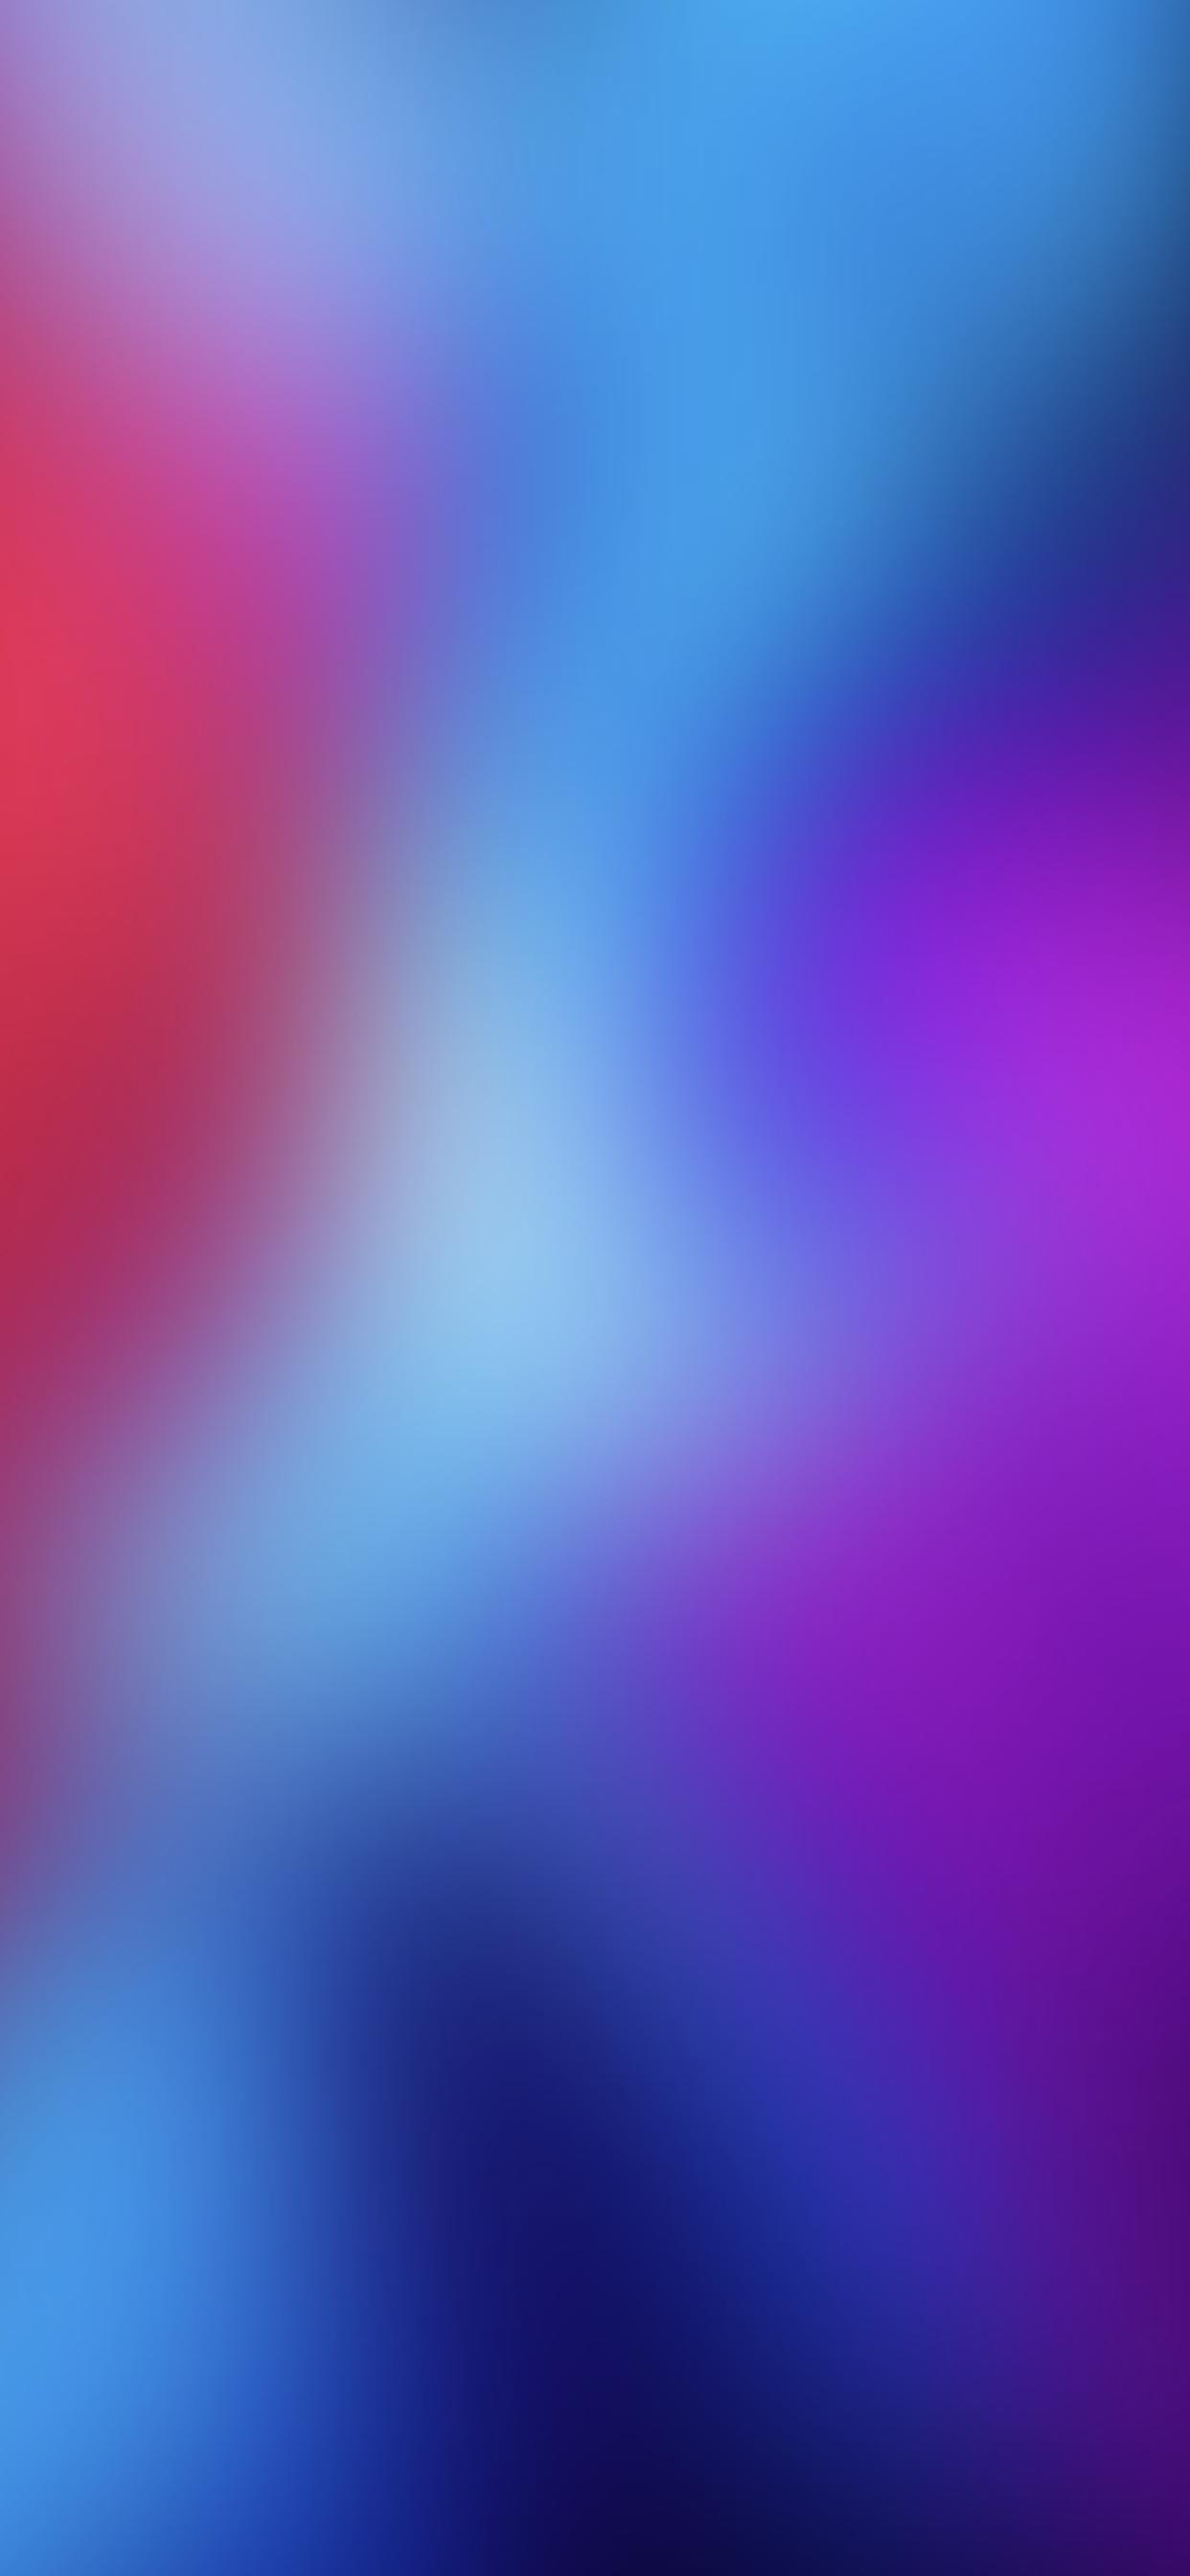 Ipad Pro Wallpaper Ytechb Exclusive Ipad Pro Wallpaper Ipad Pro Ipad Pro Background